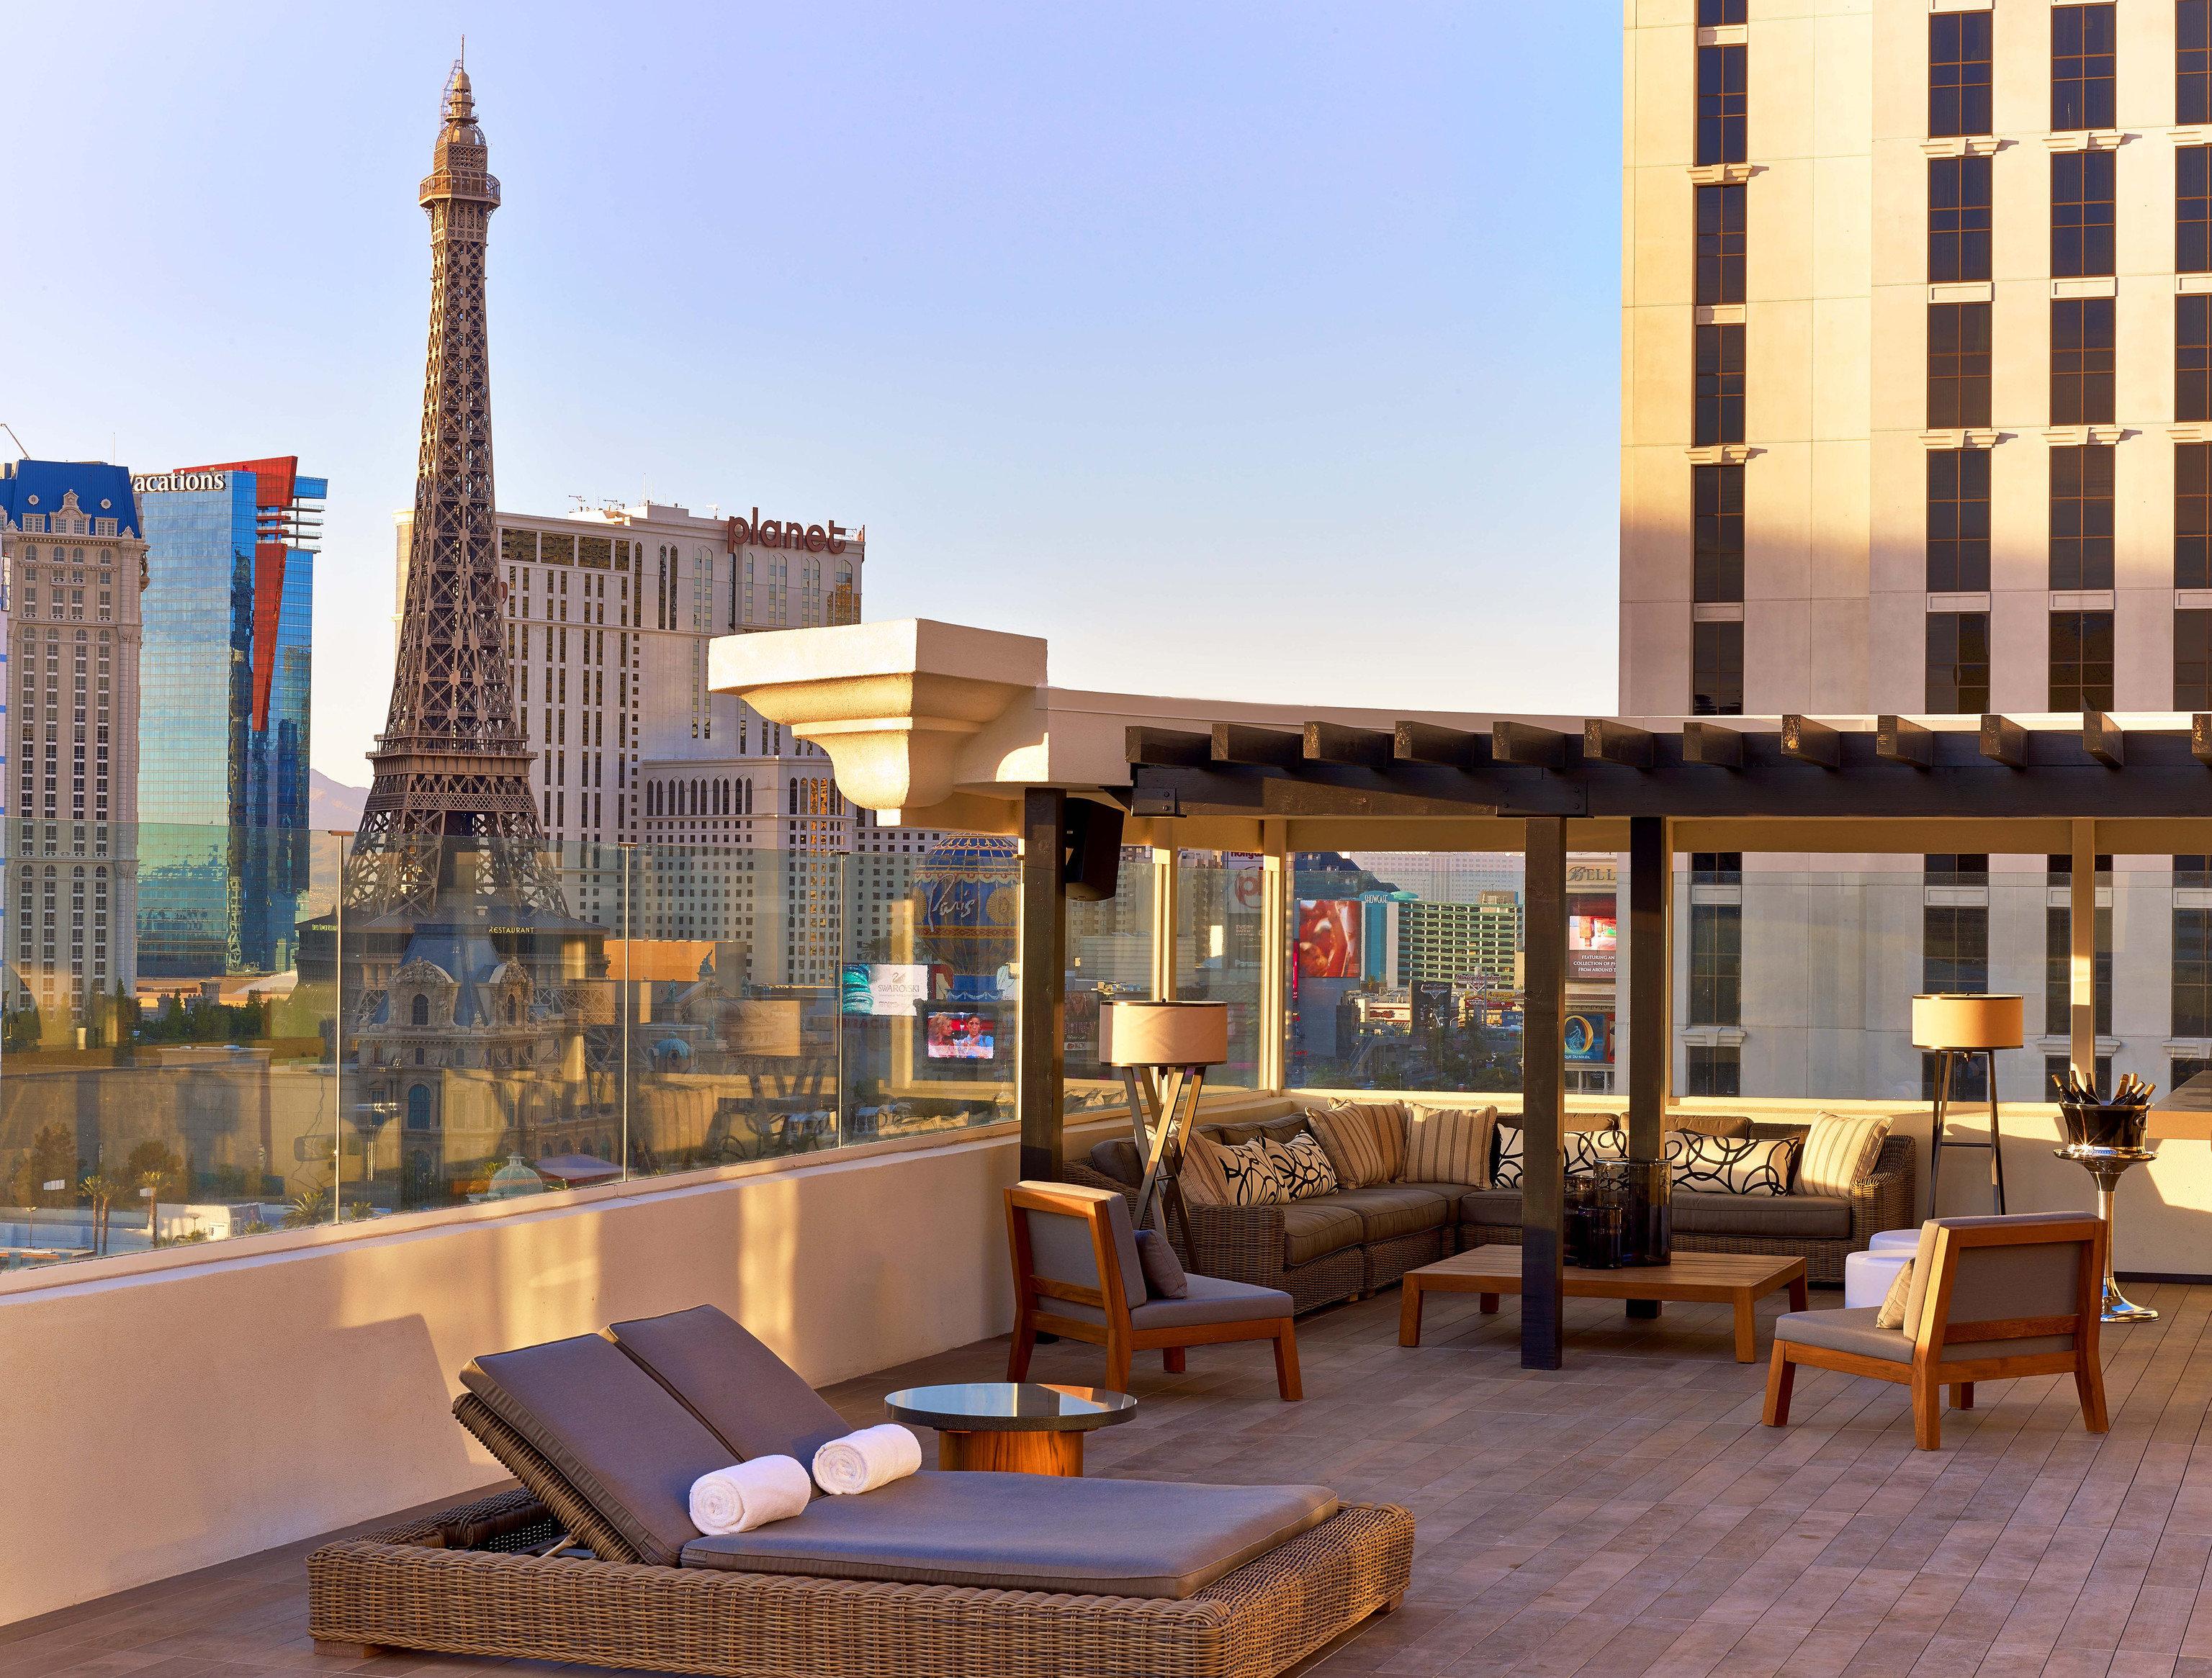 tips cruses cityscape hotel in nevada best rooms las double room vegas travel luxury mandarin hotels oriental